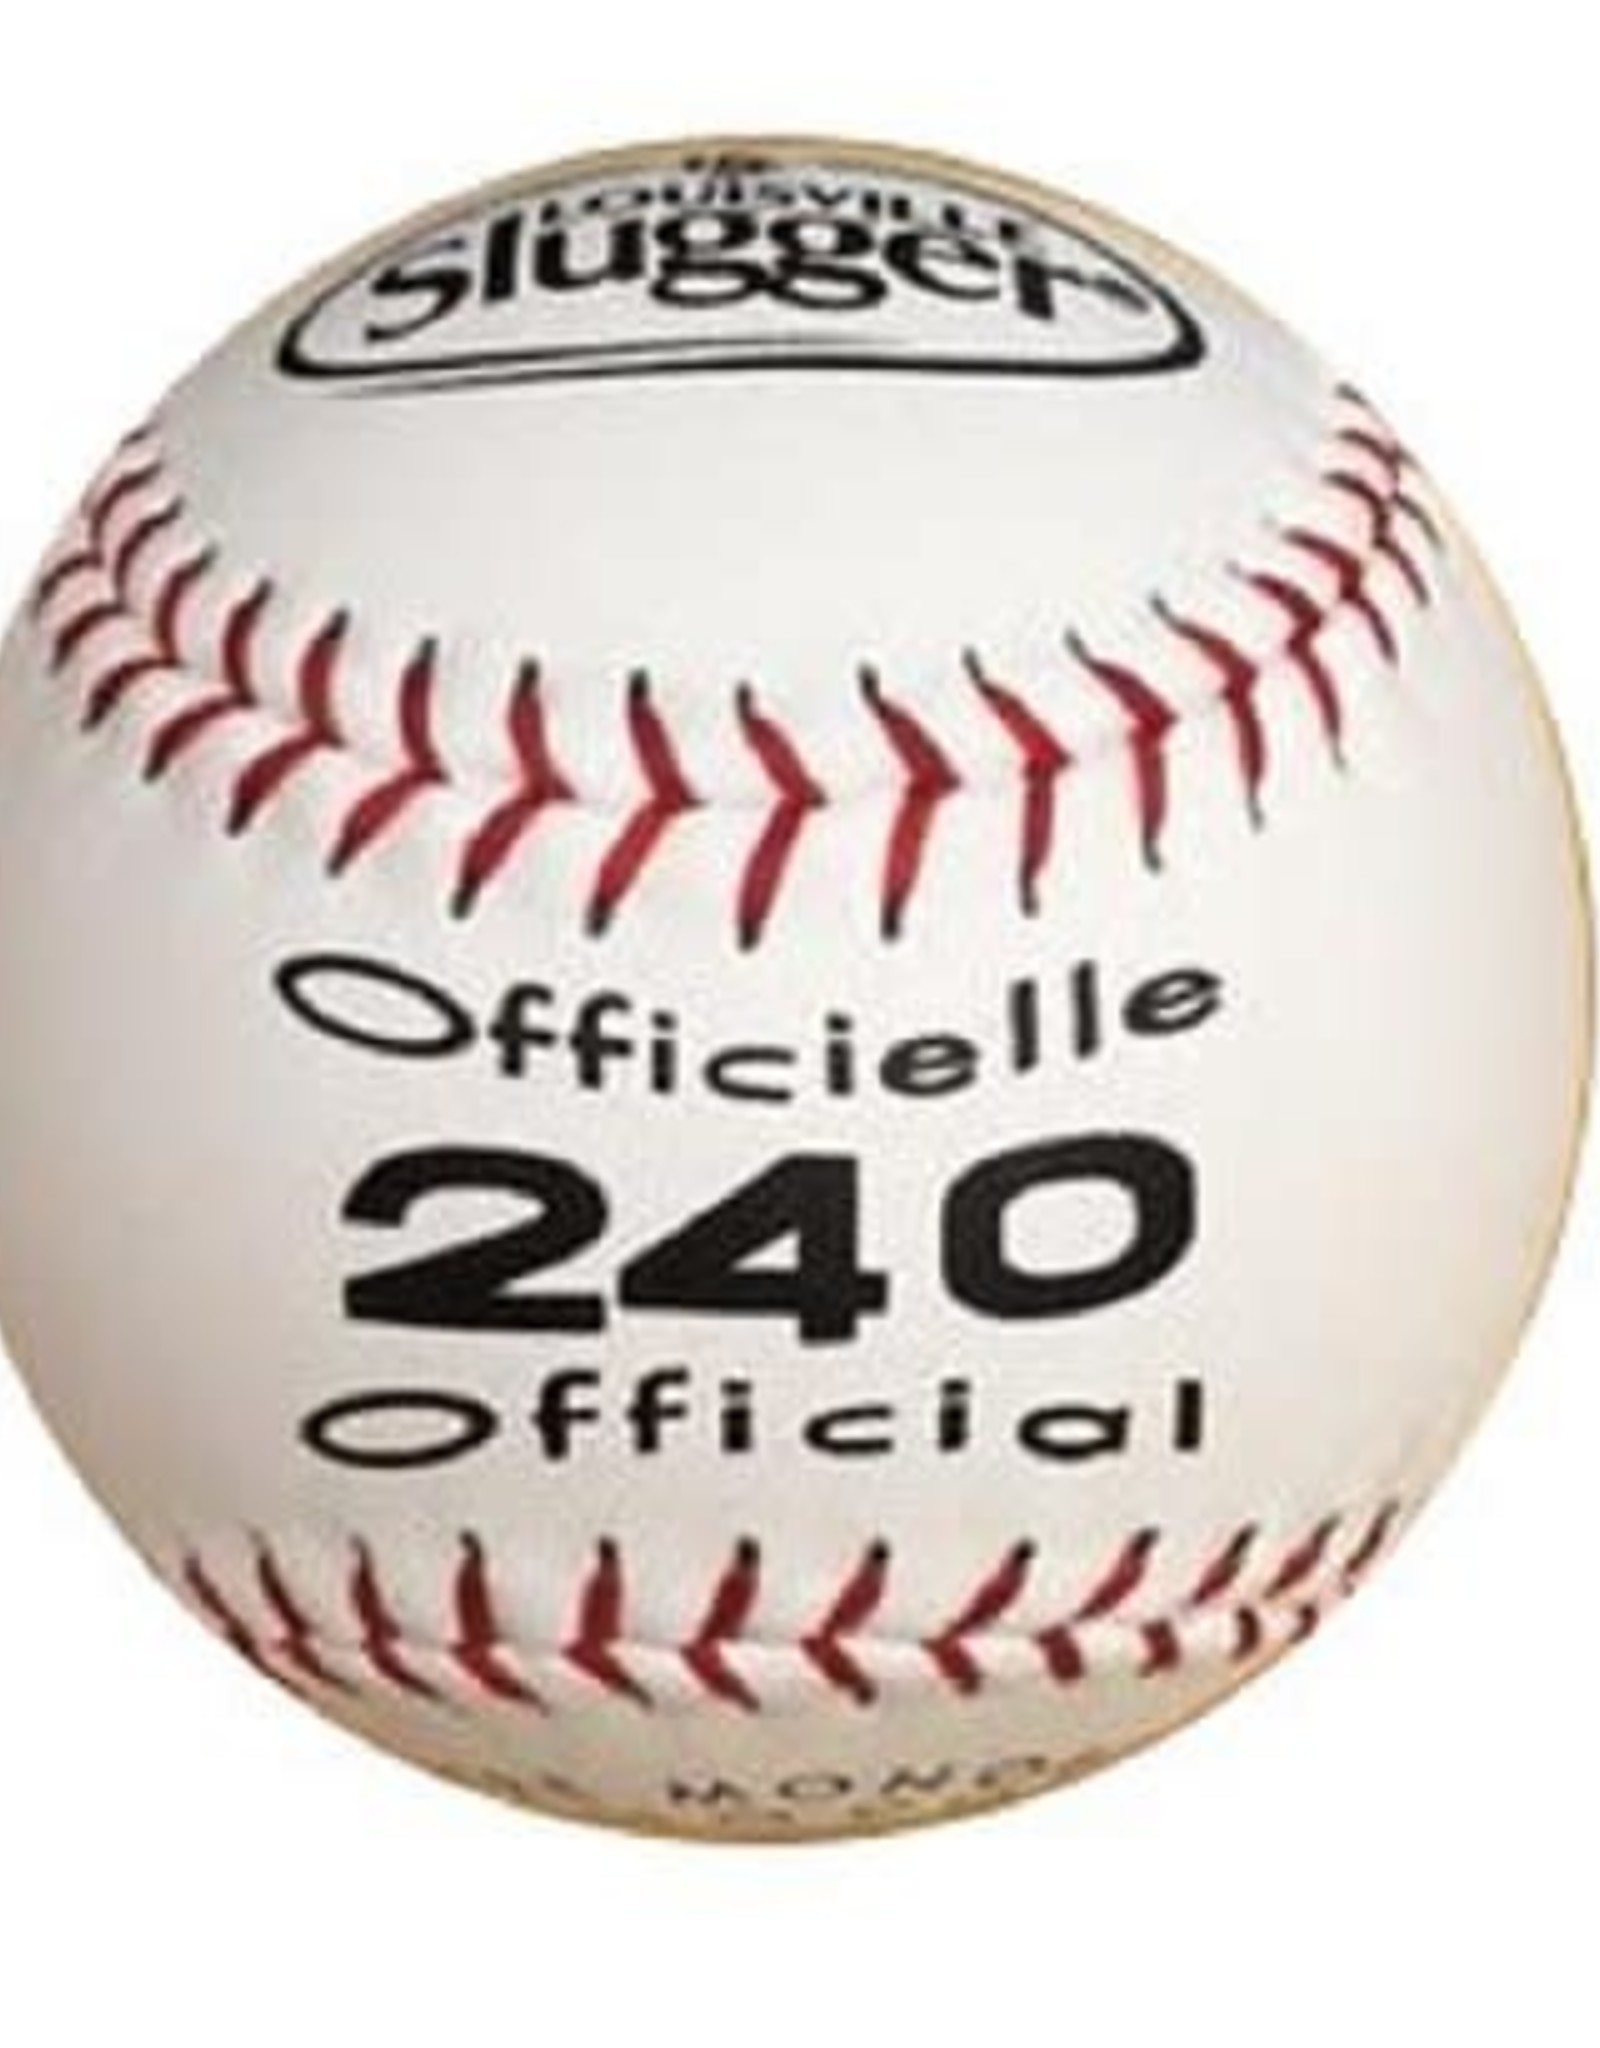 Lanctot Balle Softball 240